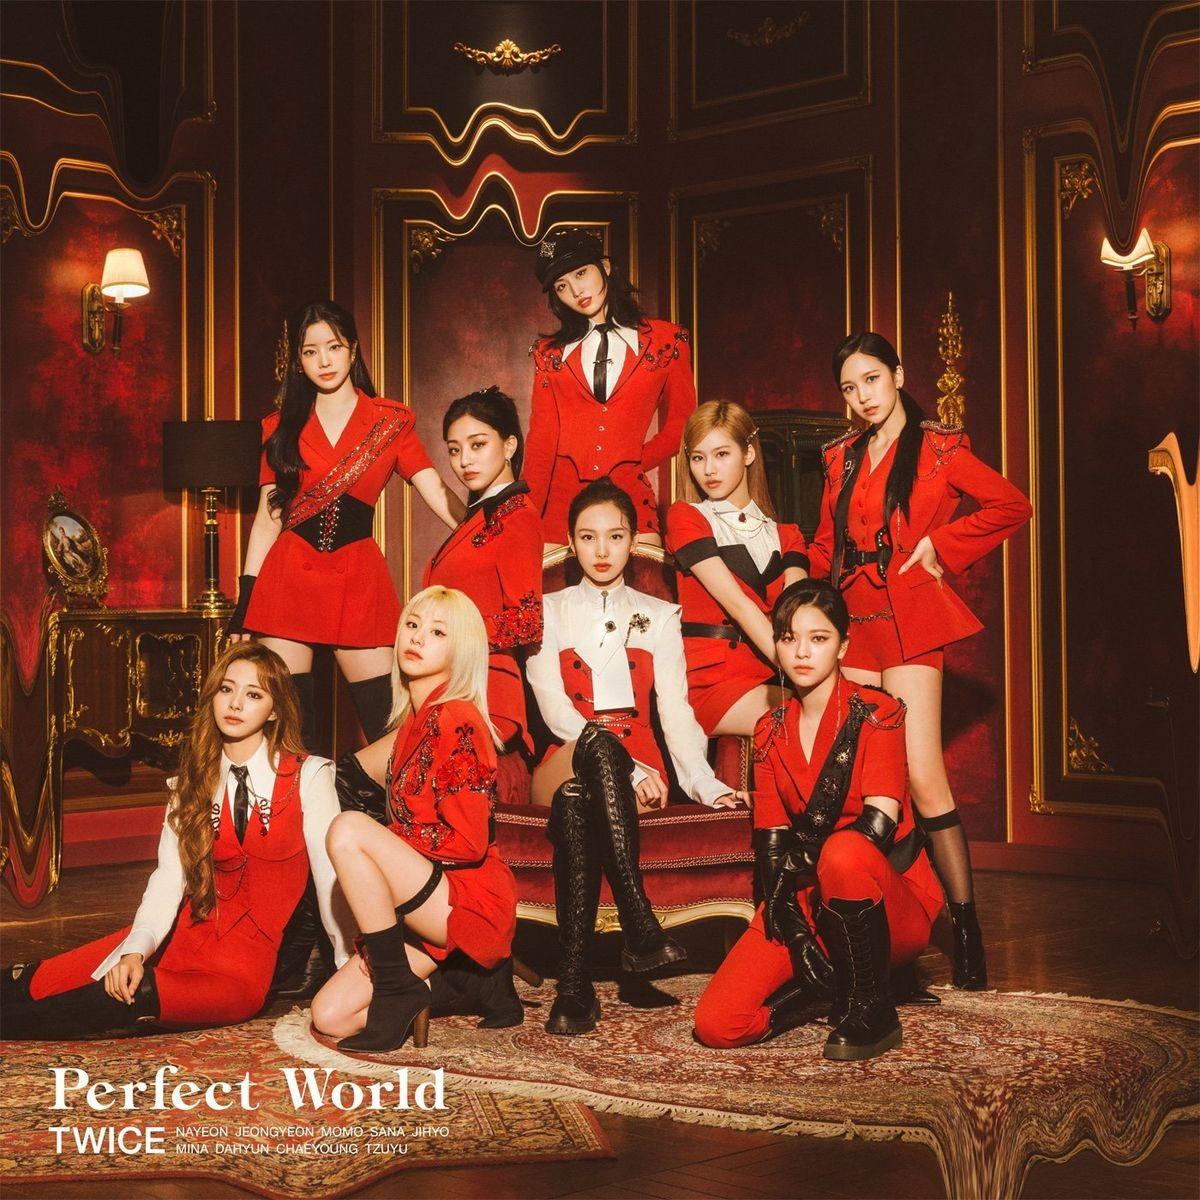 [Album] TWICE – Perfect World [FLAC + MP3 320 / WEB] [2021.07.28]